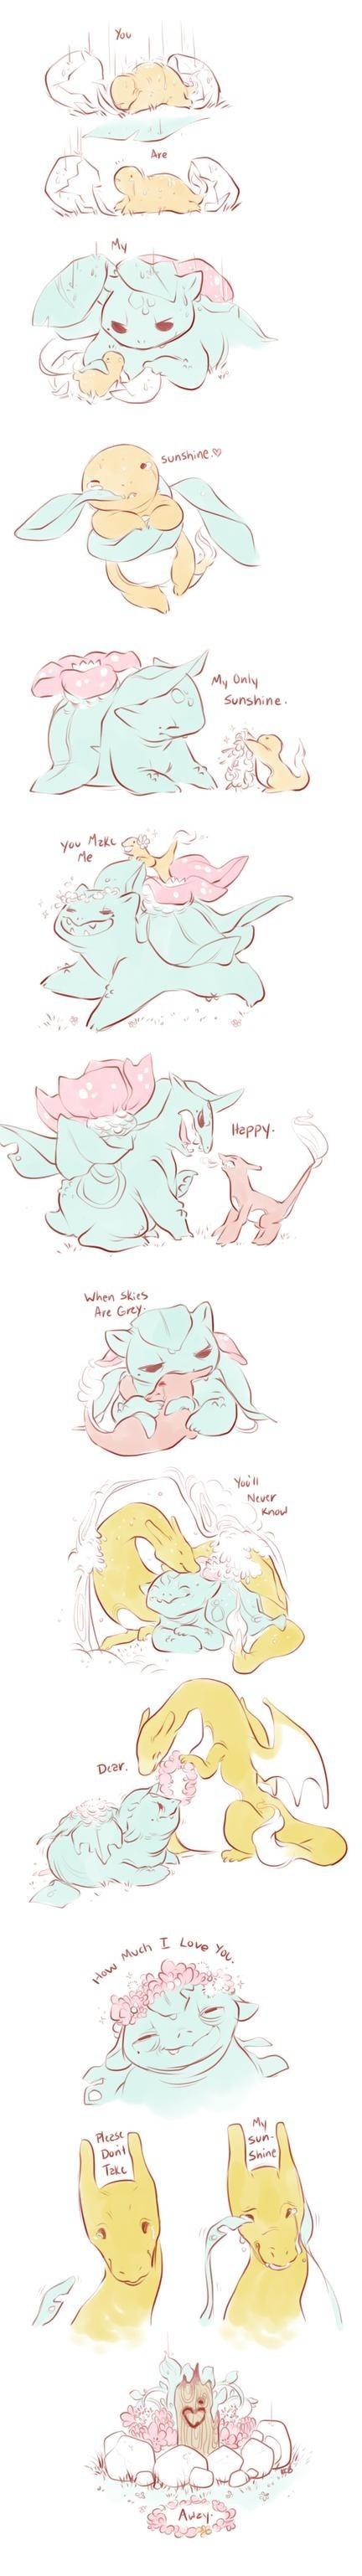 Pokémon tears Sad - 7949920256